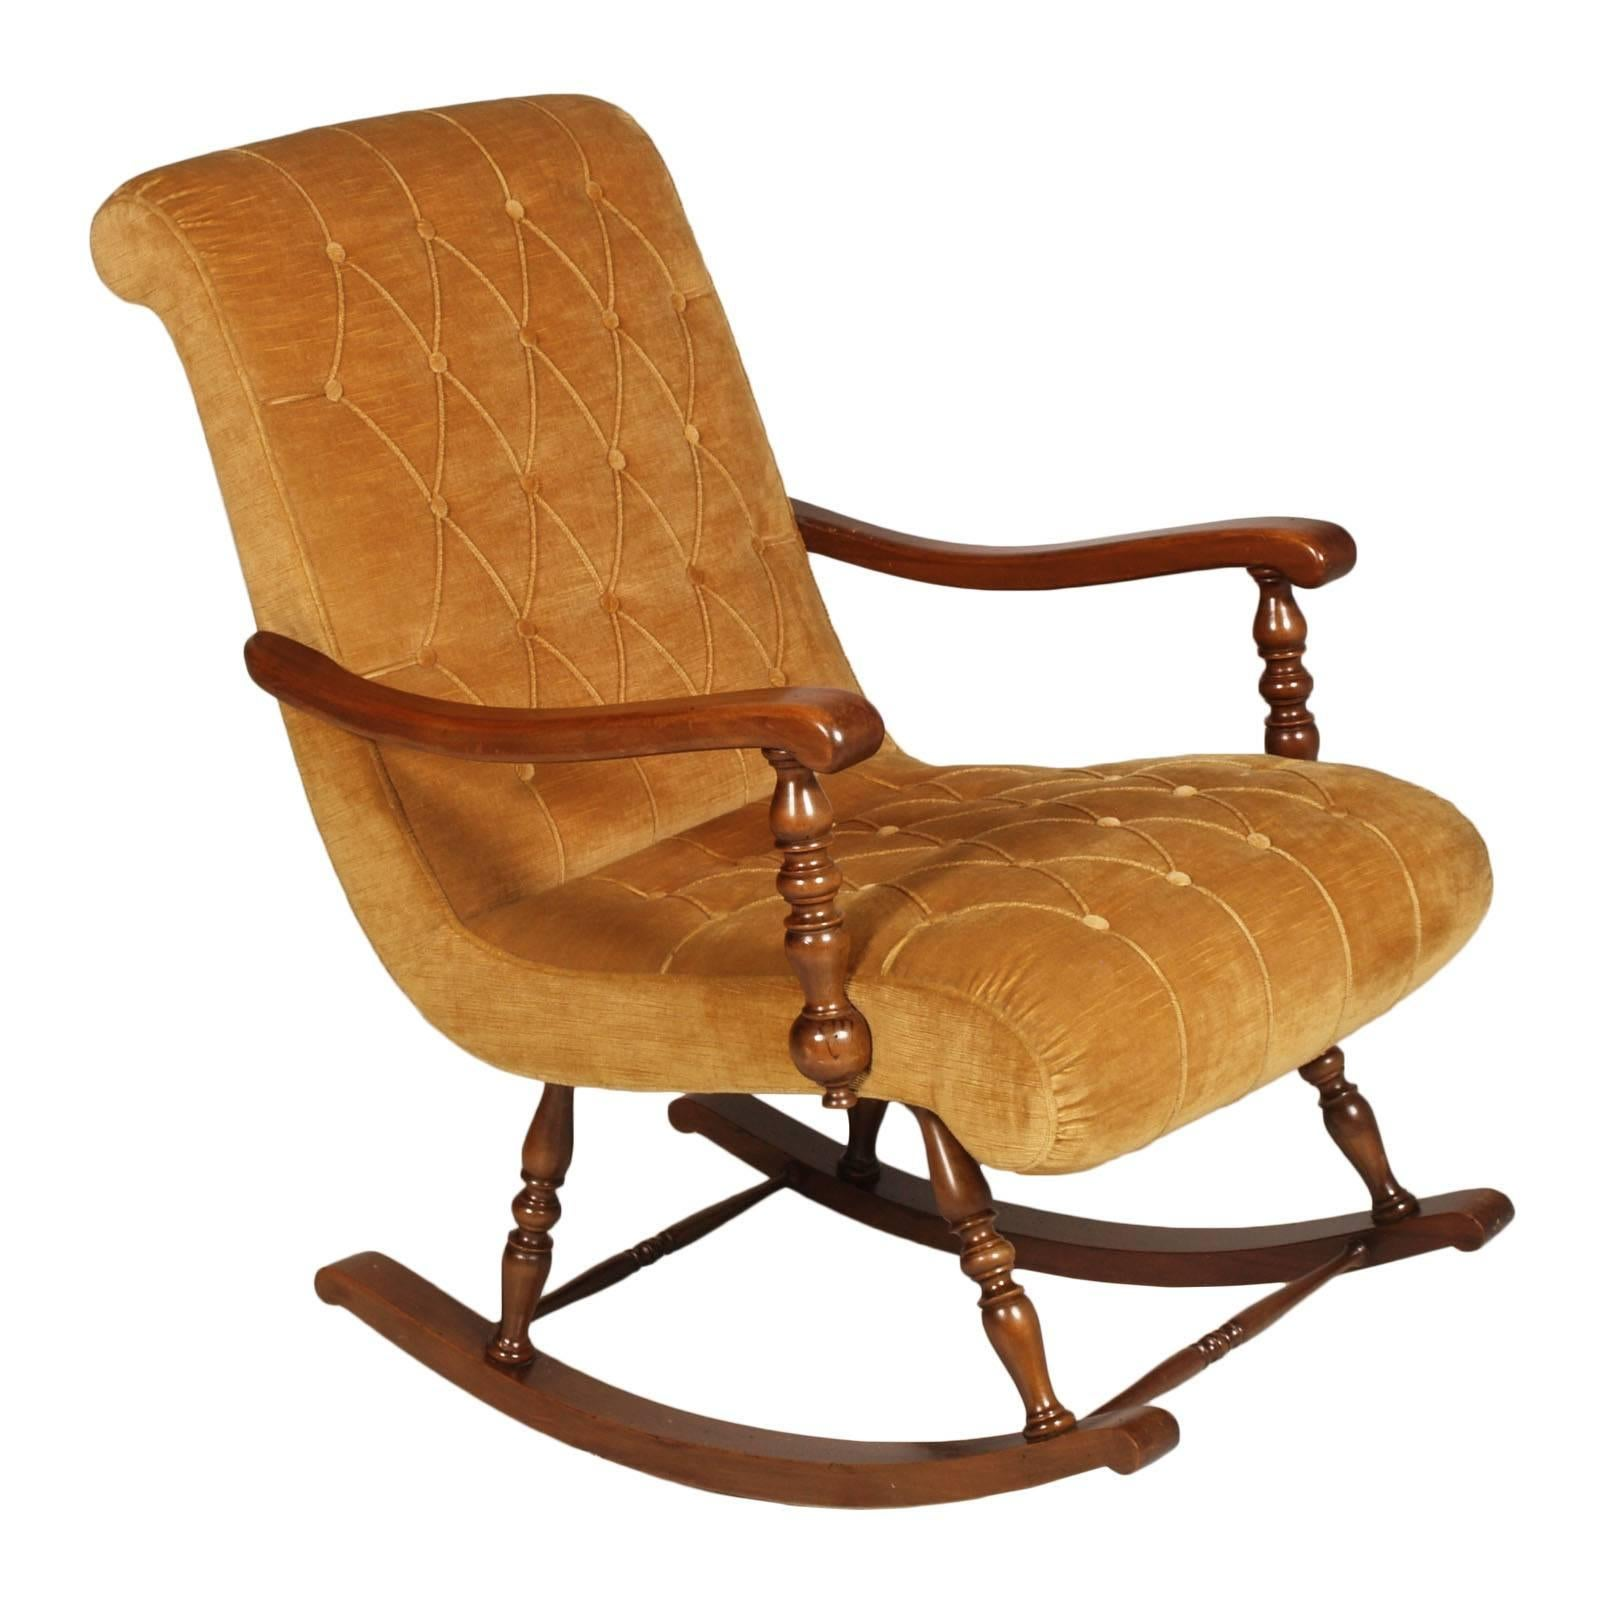 design creative inside mid rocking modern century chair chairs